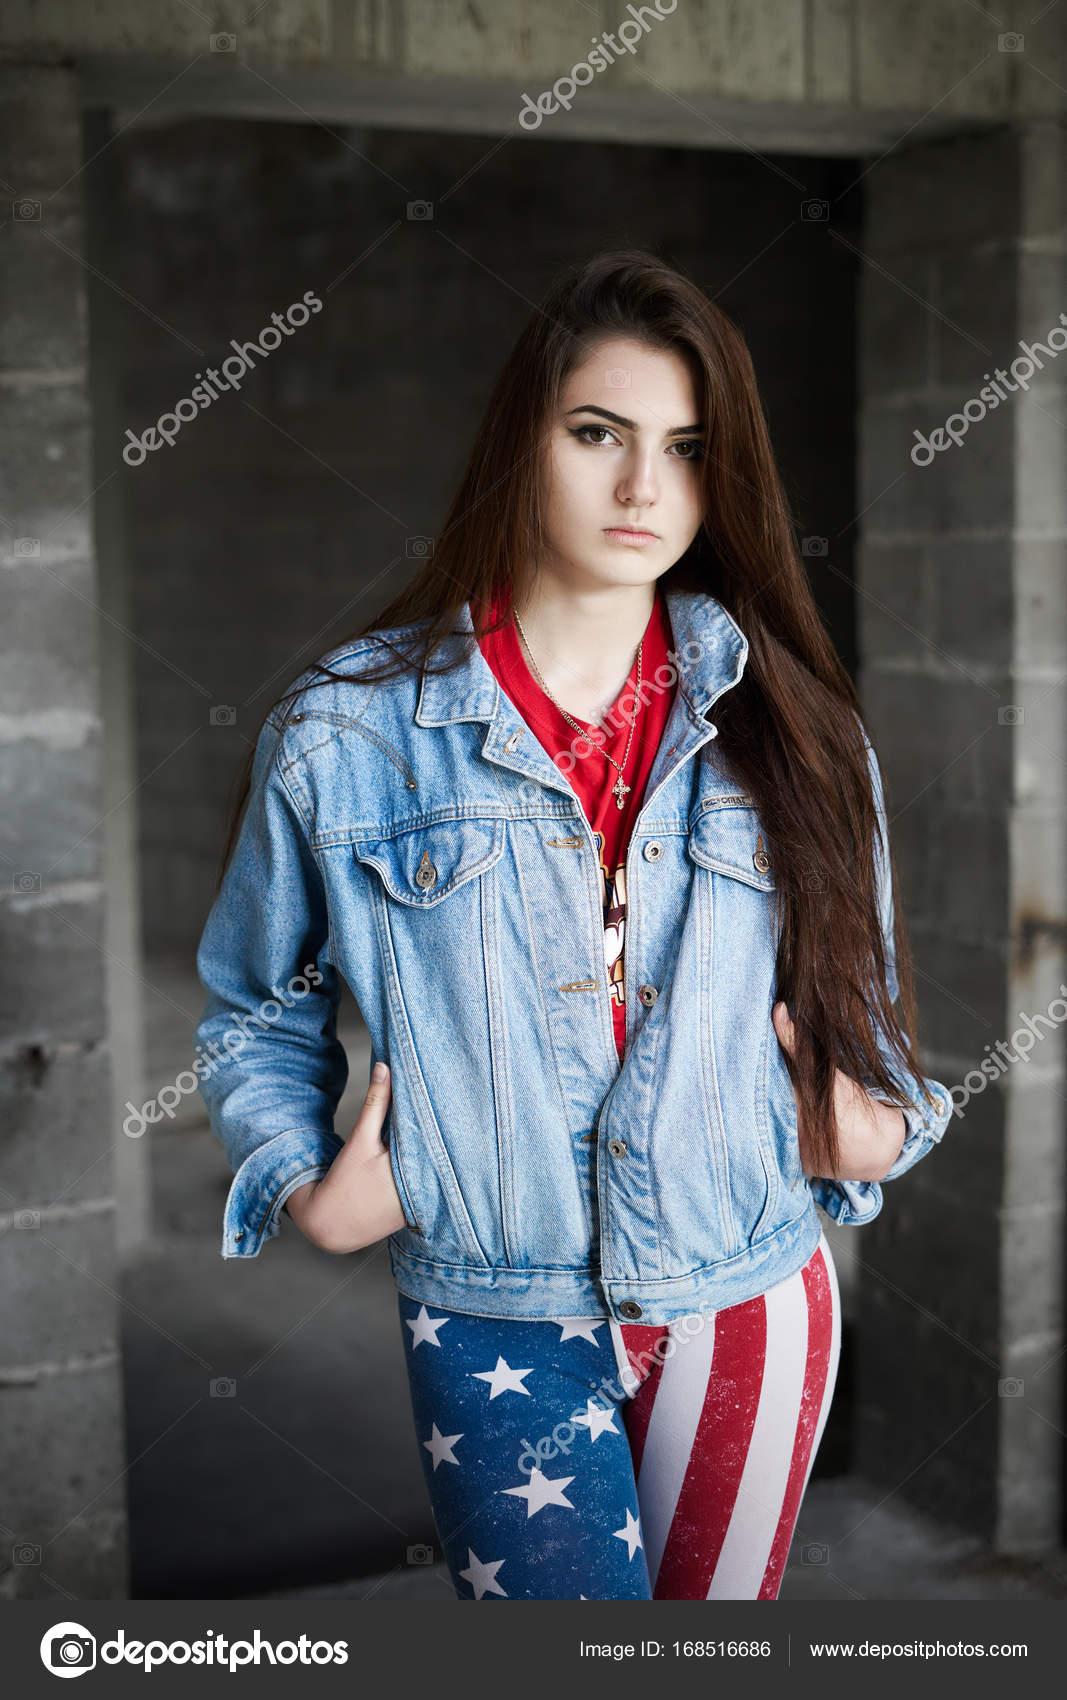 bf3b4458a18a0a Concepto: arenoso, milenaria. Hermosa hermosa joven usa Usa ropa temática  sesión de fotos en construcción abandonada del edificio que presenta el  contraste ...